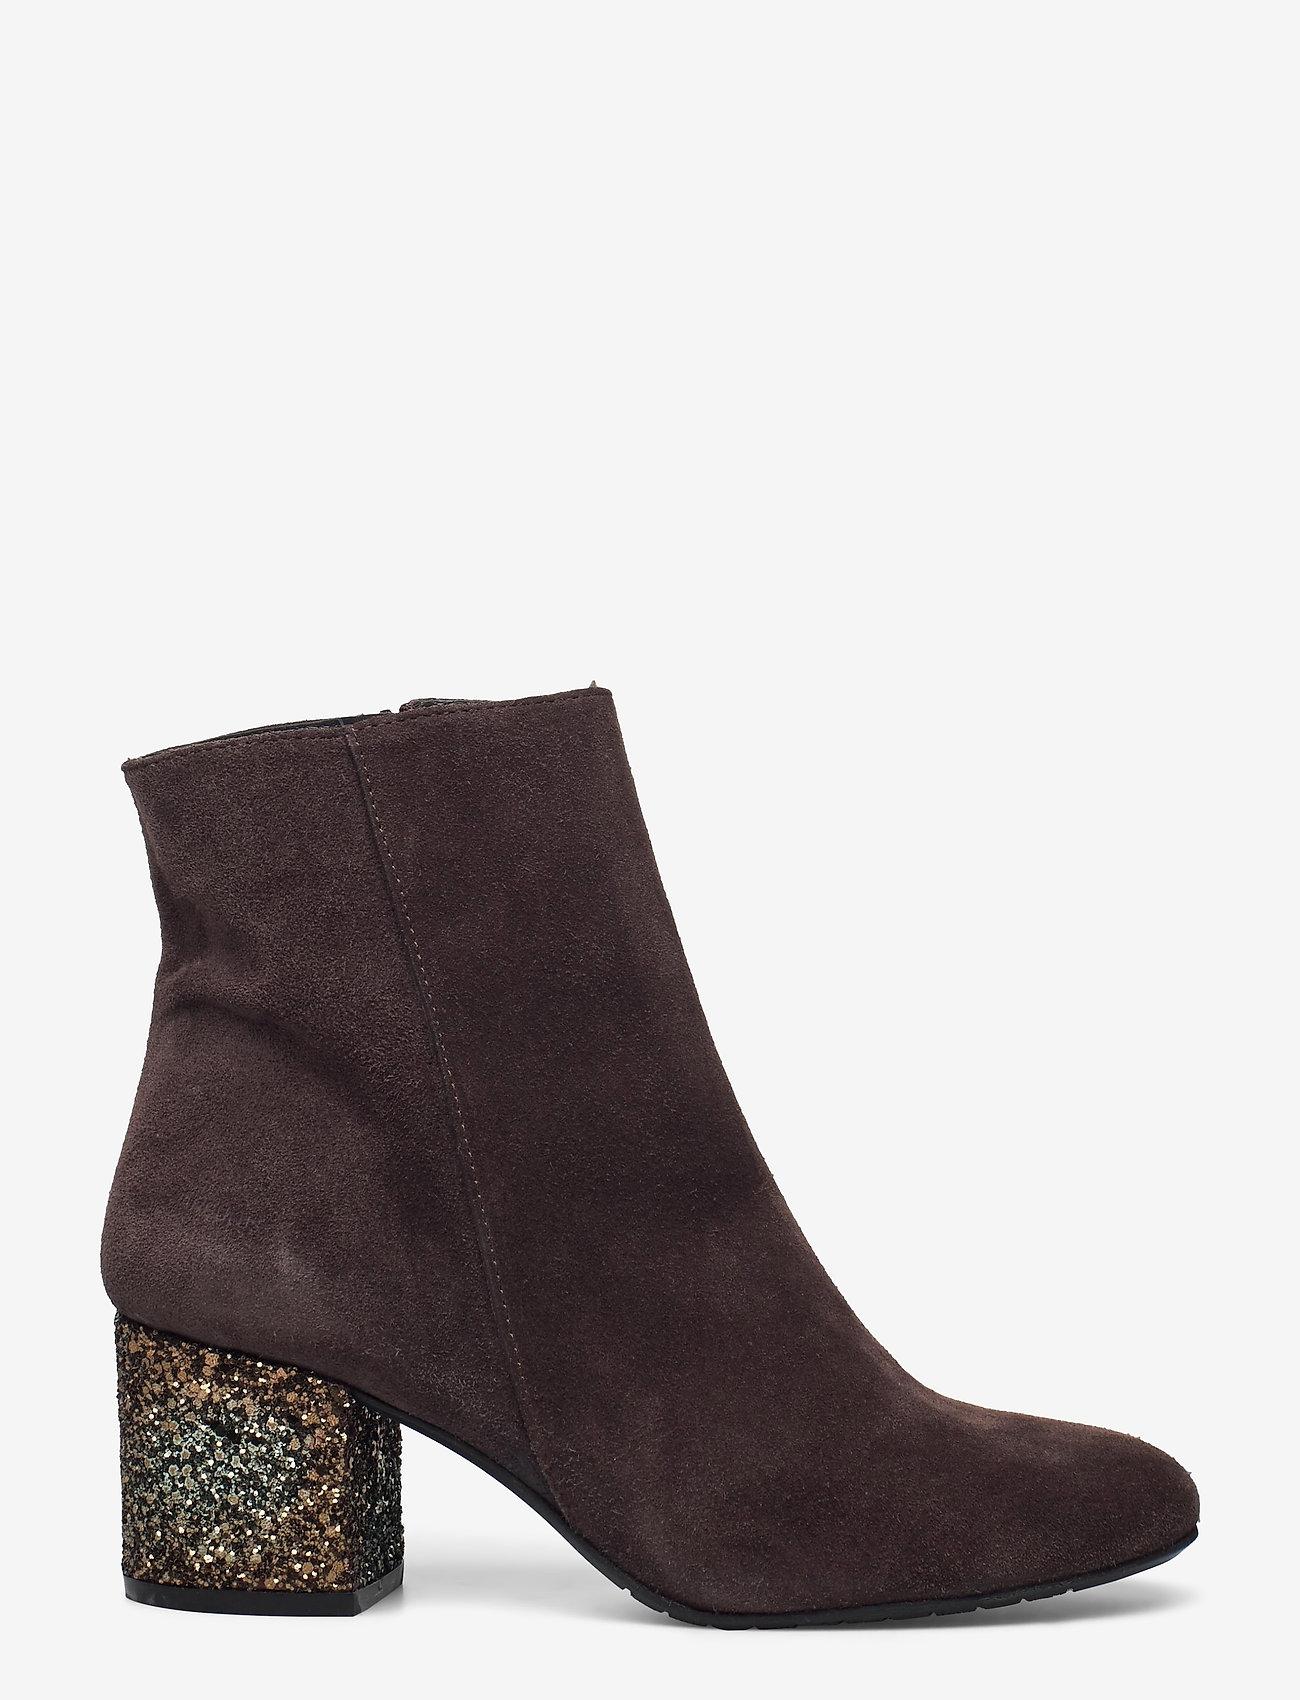 ANGULUS - Bootie - block heel - with zippe - stiefeletten mit absatz - 2193/2487 brown/copper glit - 1